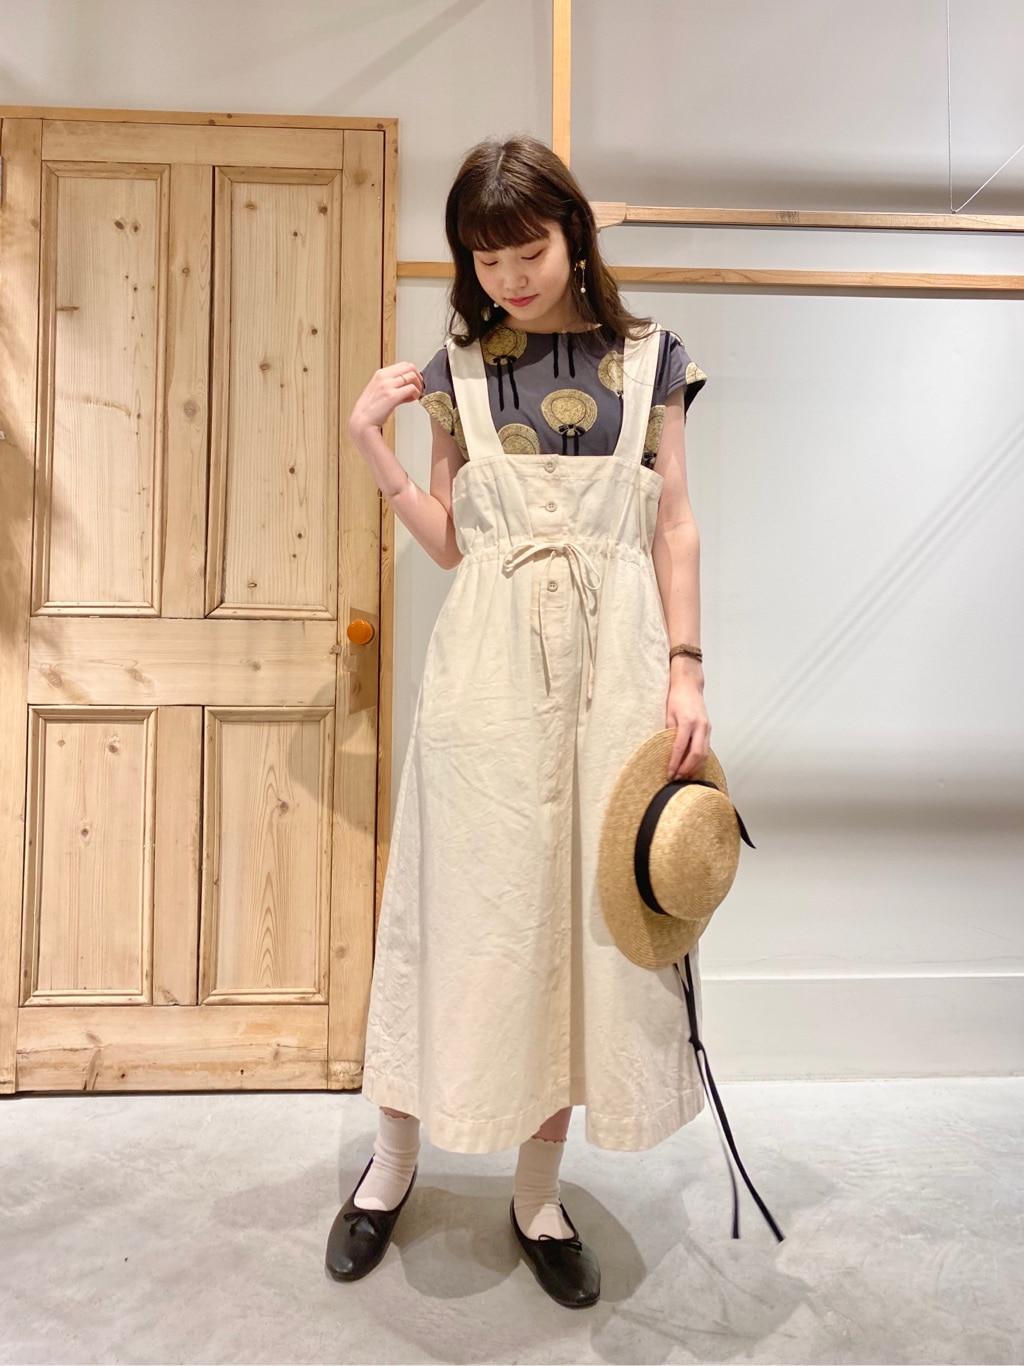 Malle chambre de charme 調布パルコ 身長:167cm 2020.06.10